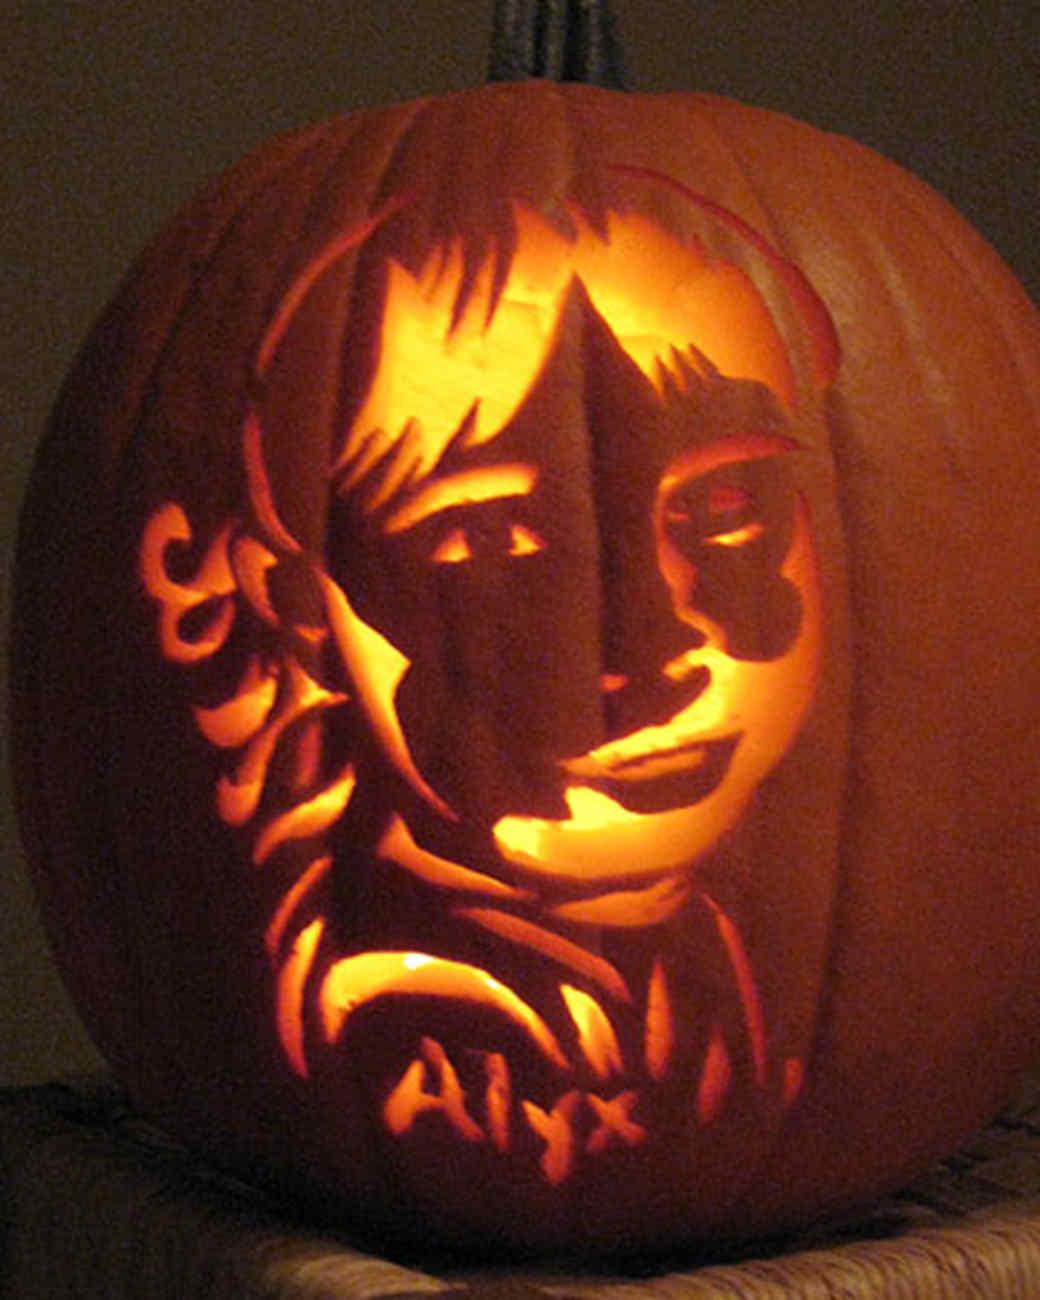 alyx_pumpkin.jpg